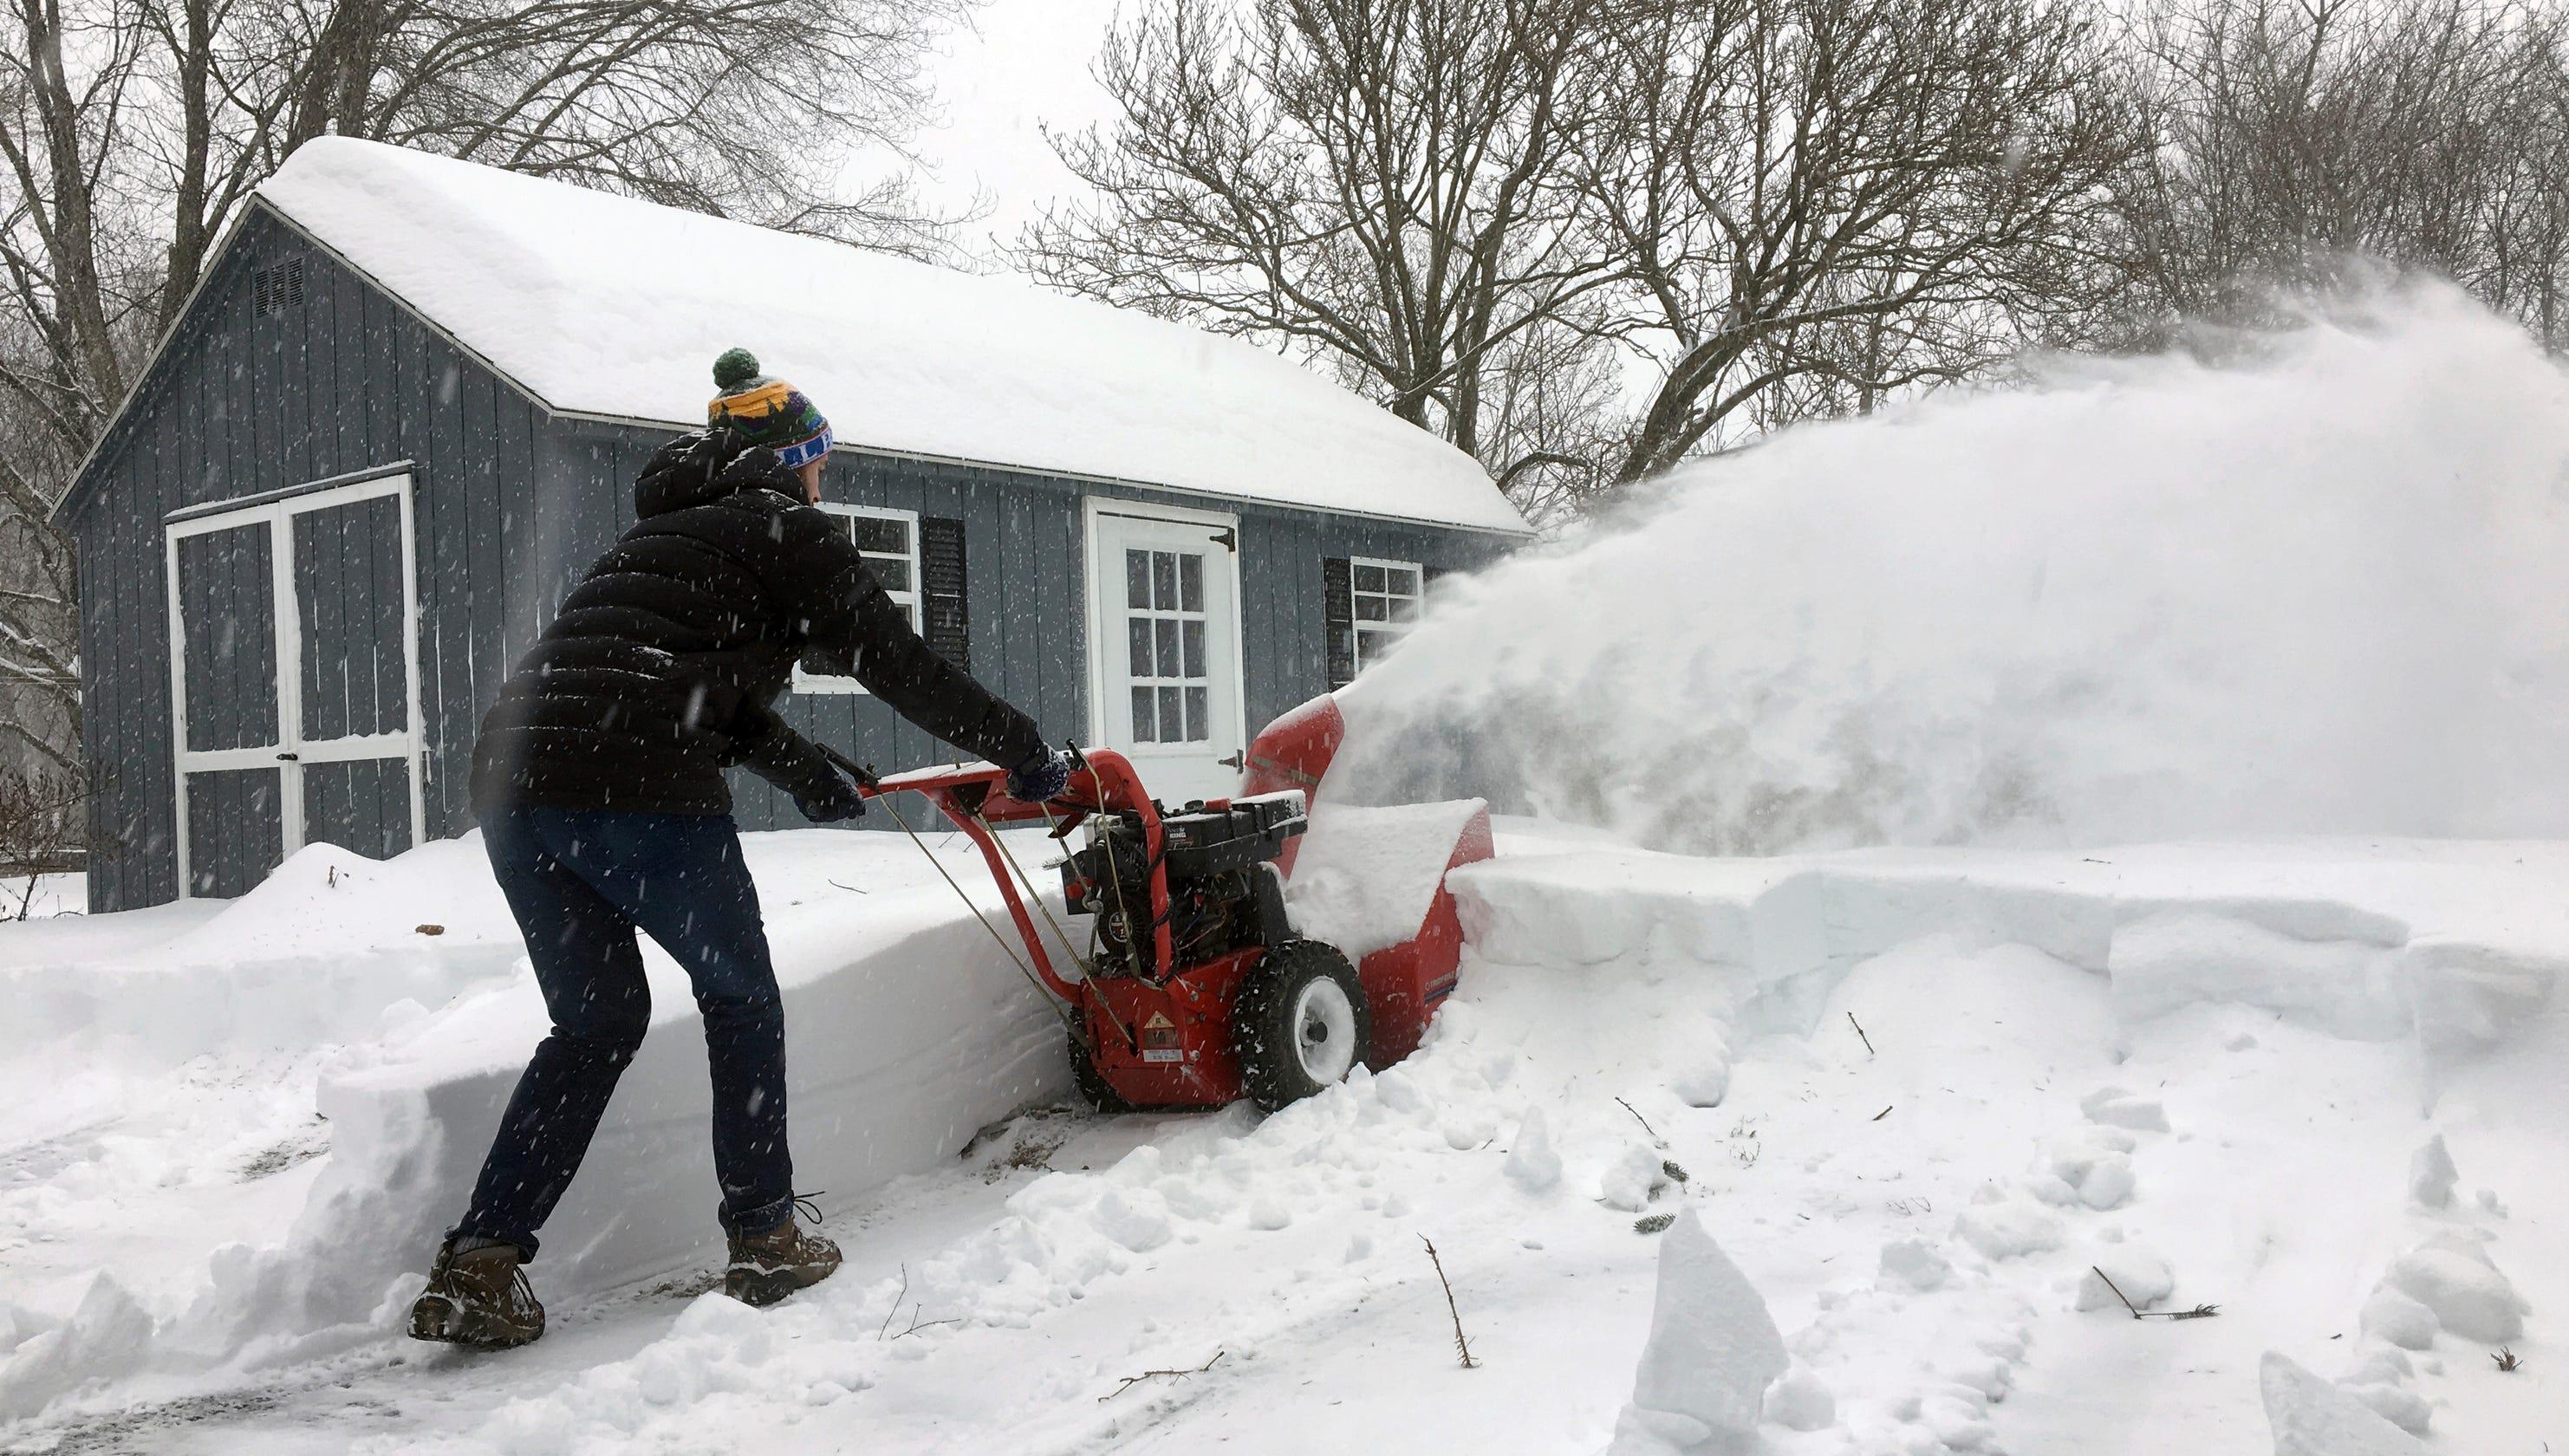 Winter storm: Snow, wind, cold wreak havoc in Midwest